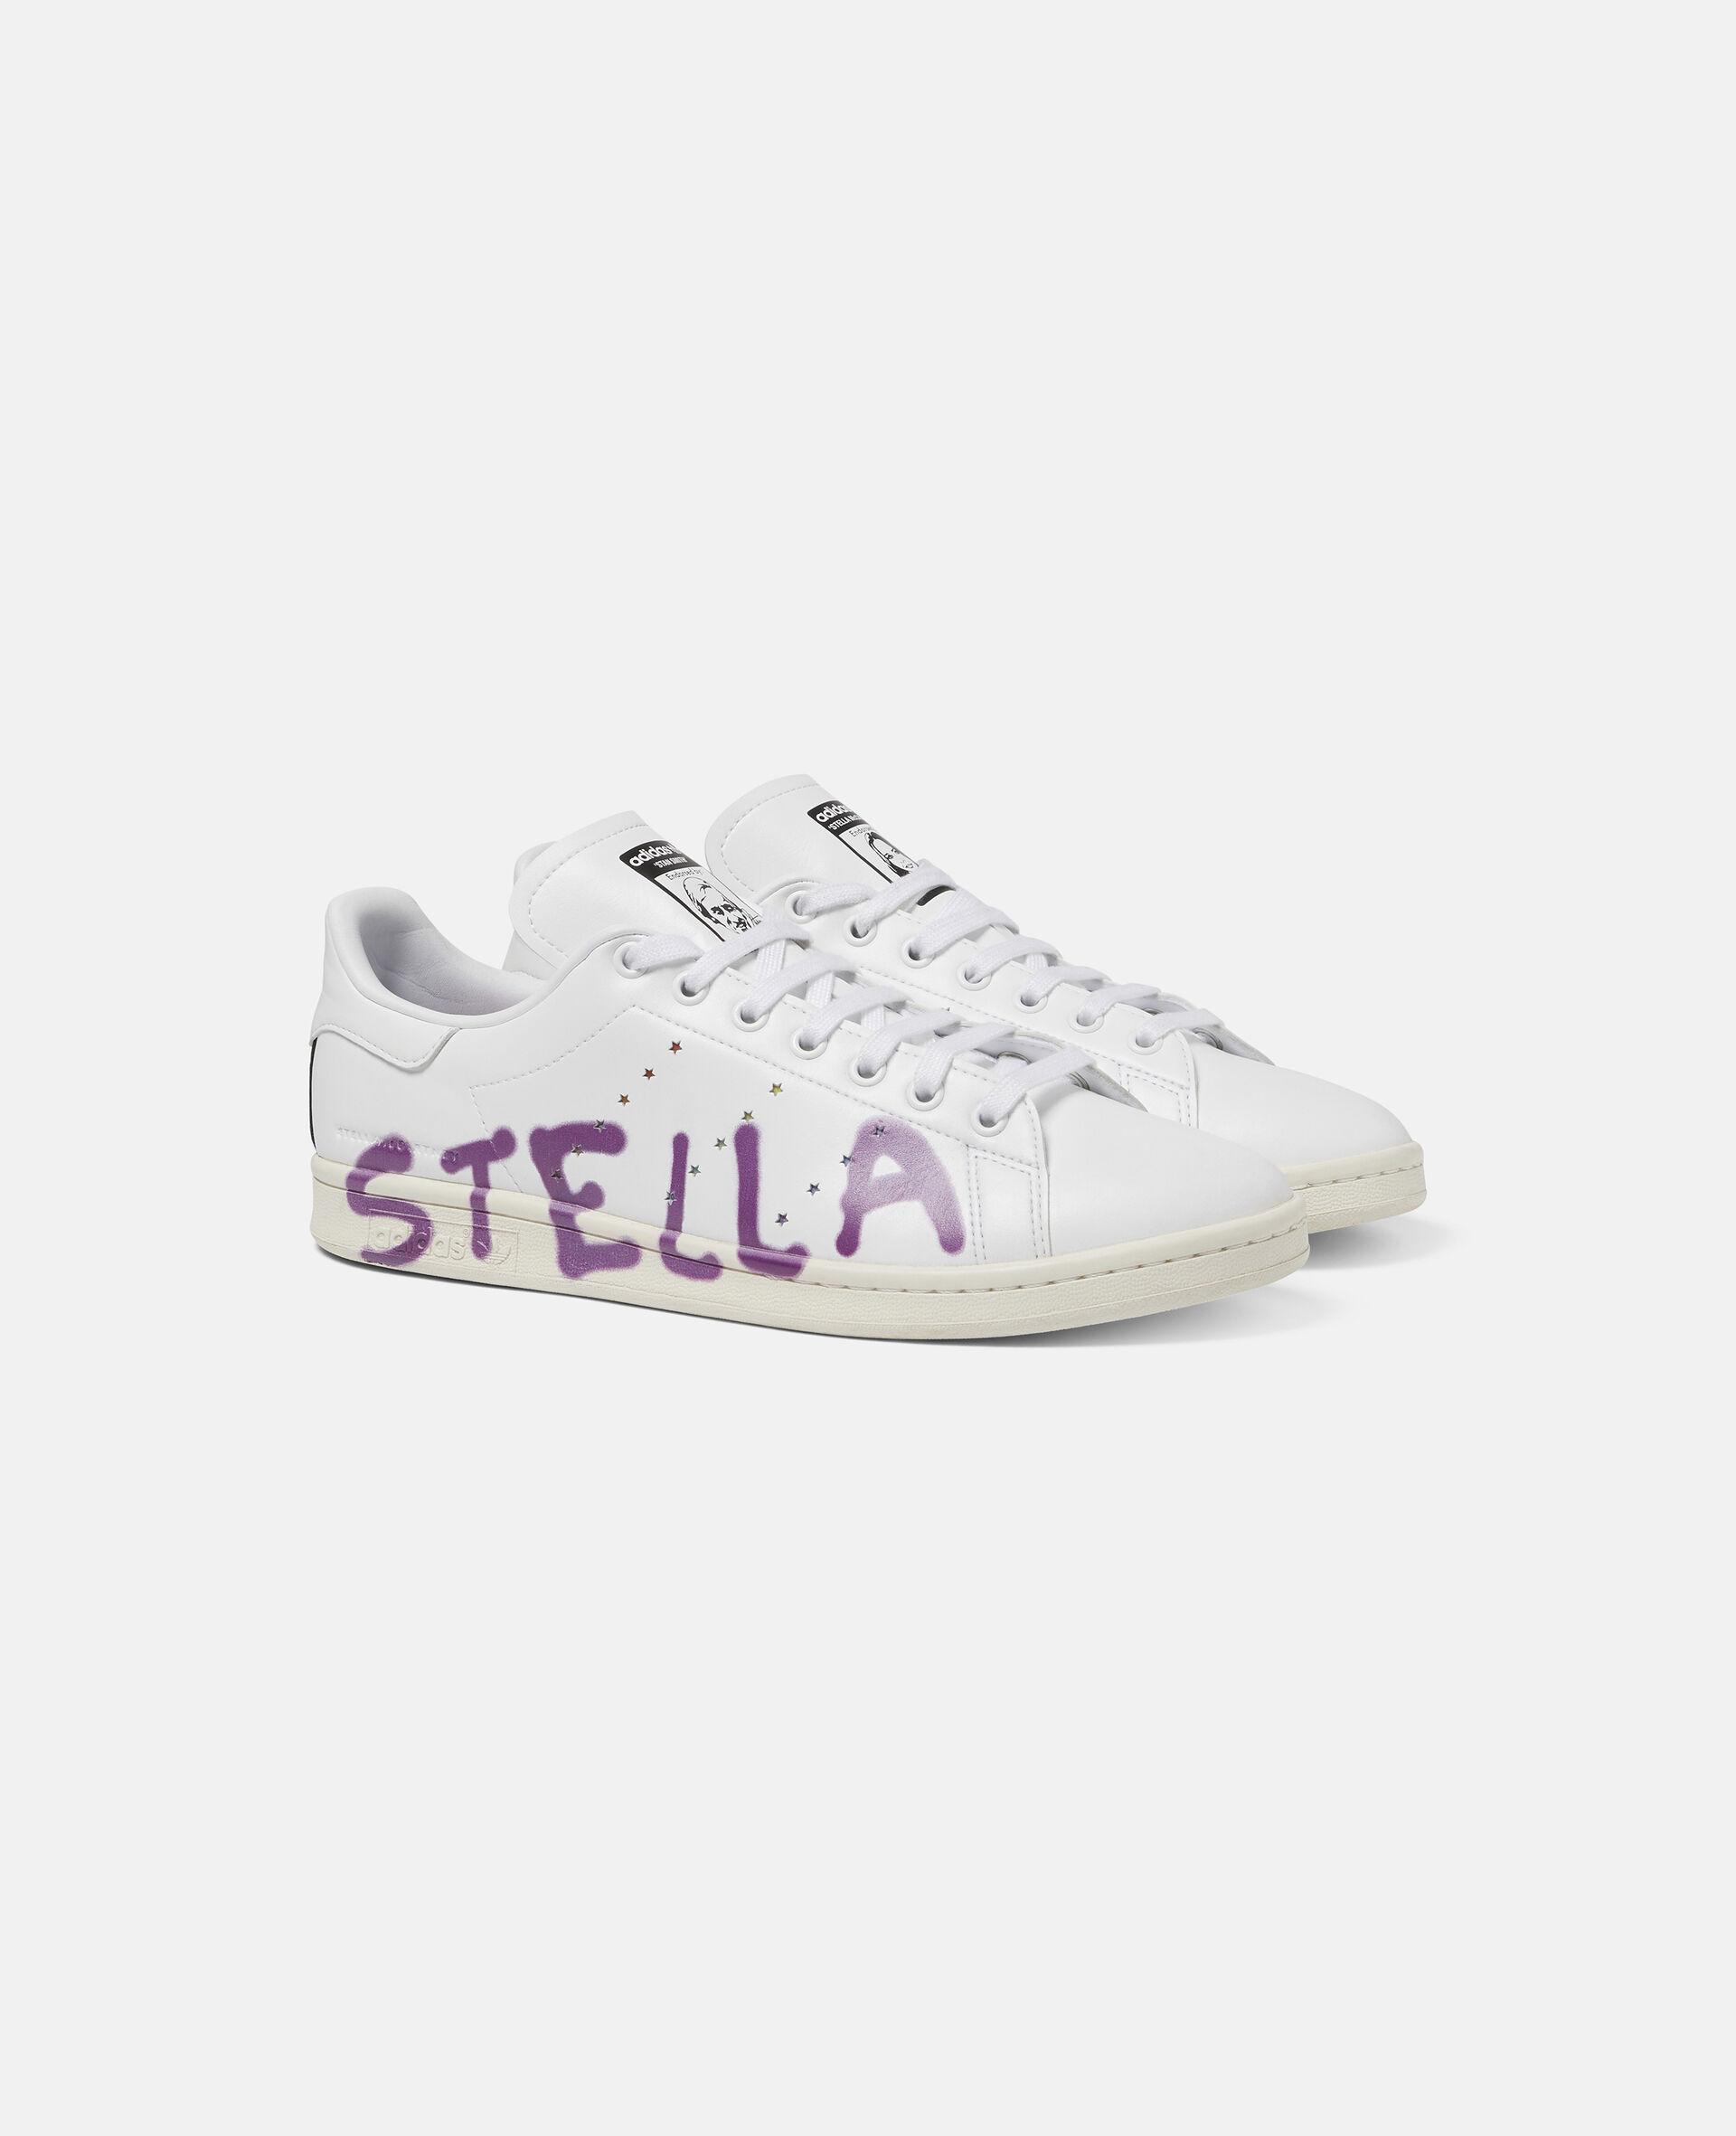 Ed Curtis Stella StanSmith adidas-White-large image number 2